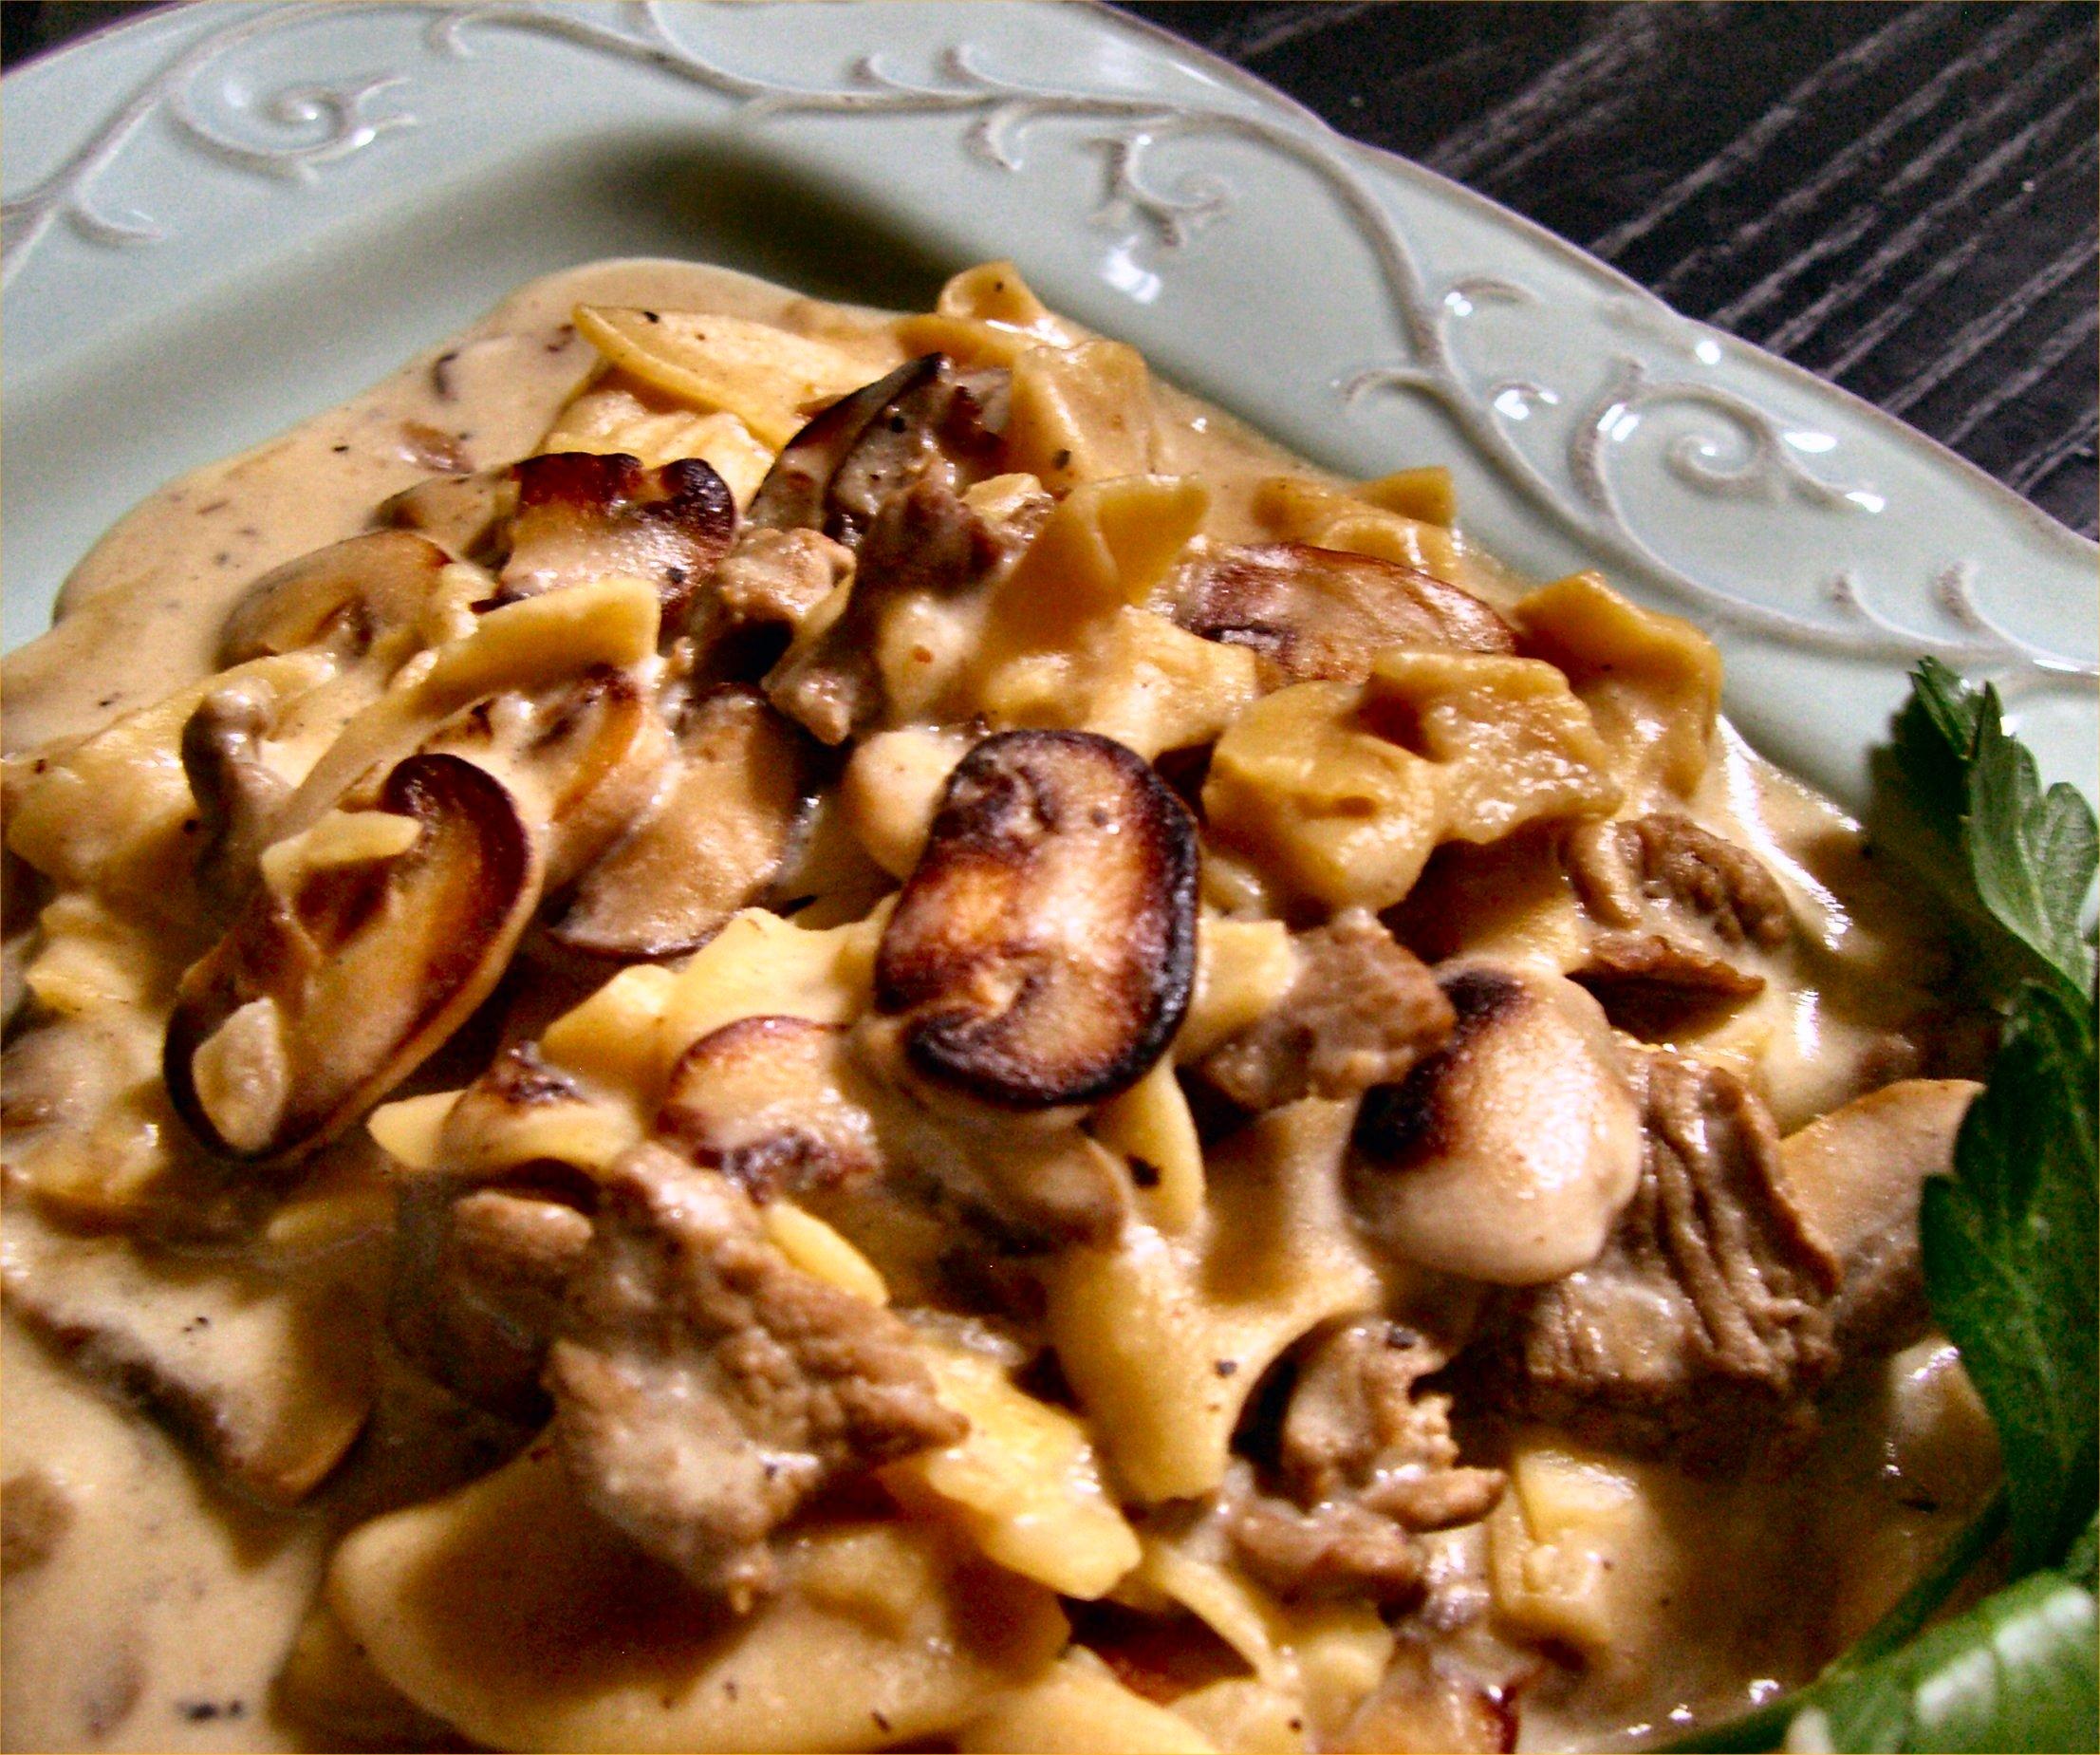 Tasty Kitchen: A Happy Recipe